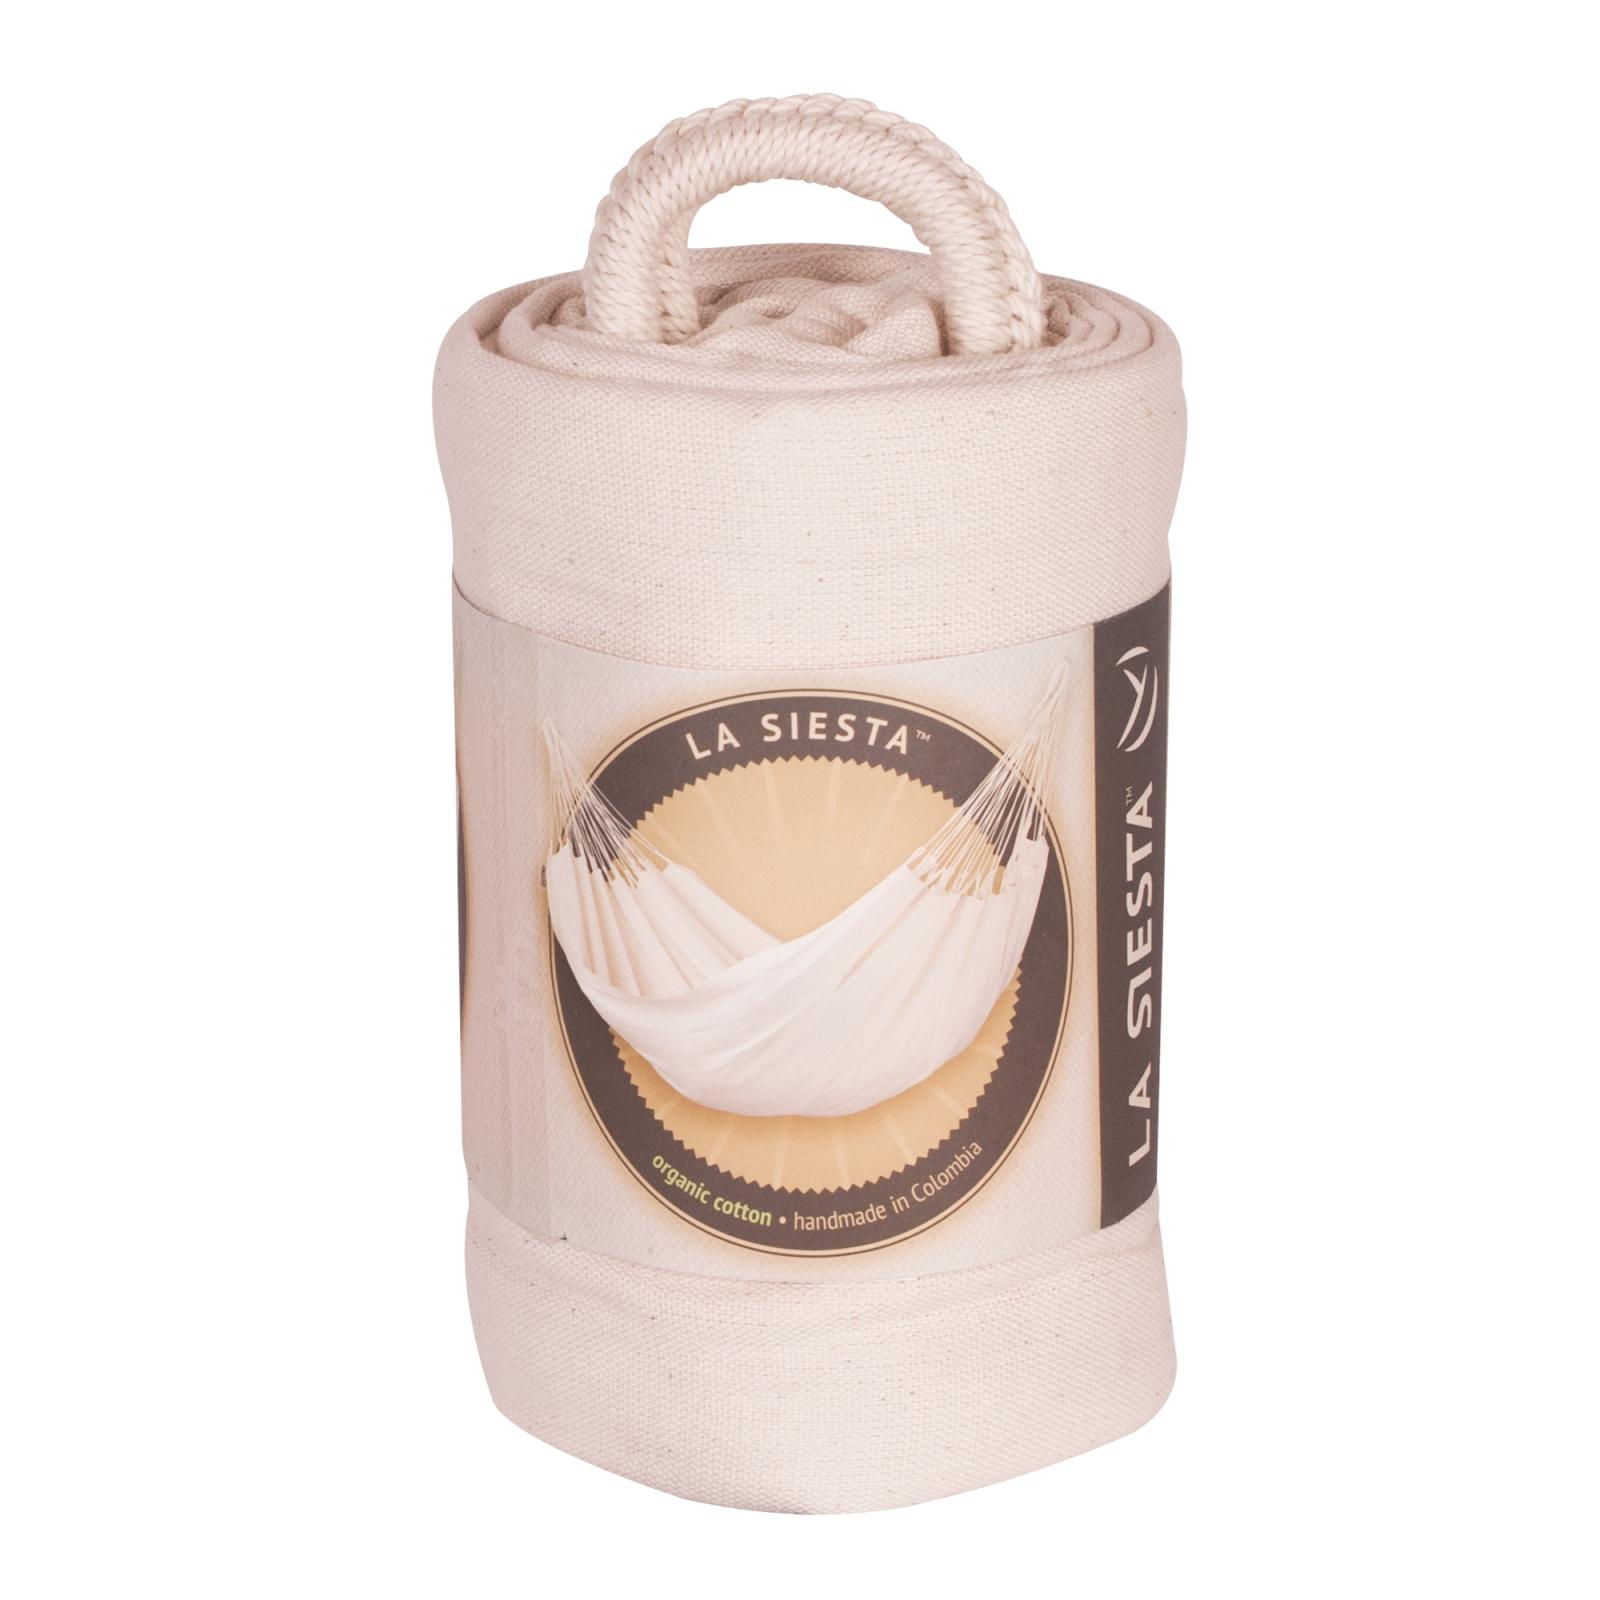 La La La Siesta Hängematte MODESTA Farbe Latte Singlehängematte MOH14-1 84caca